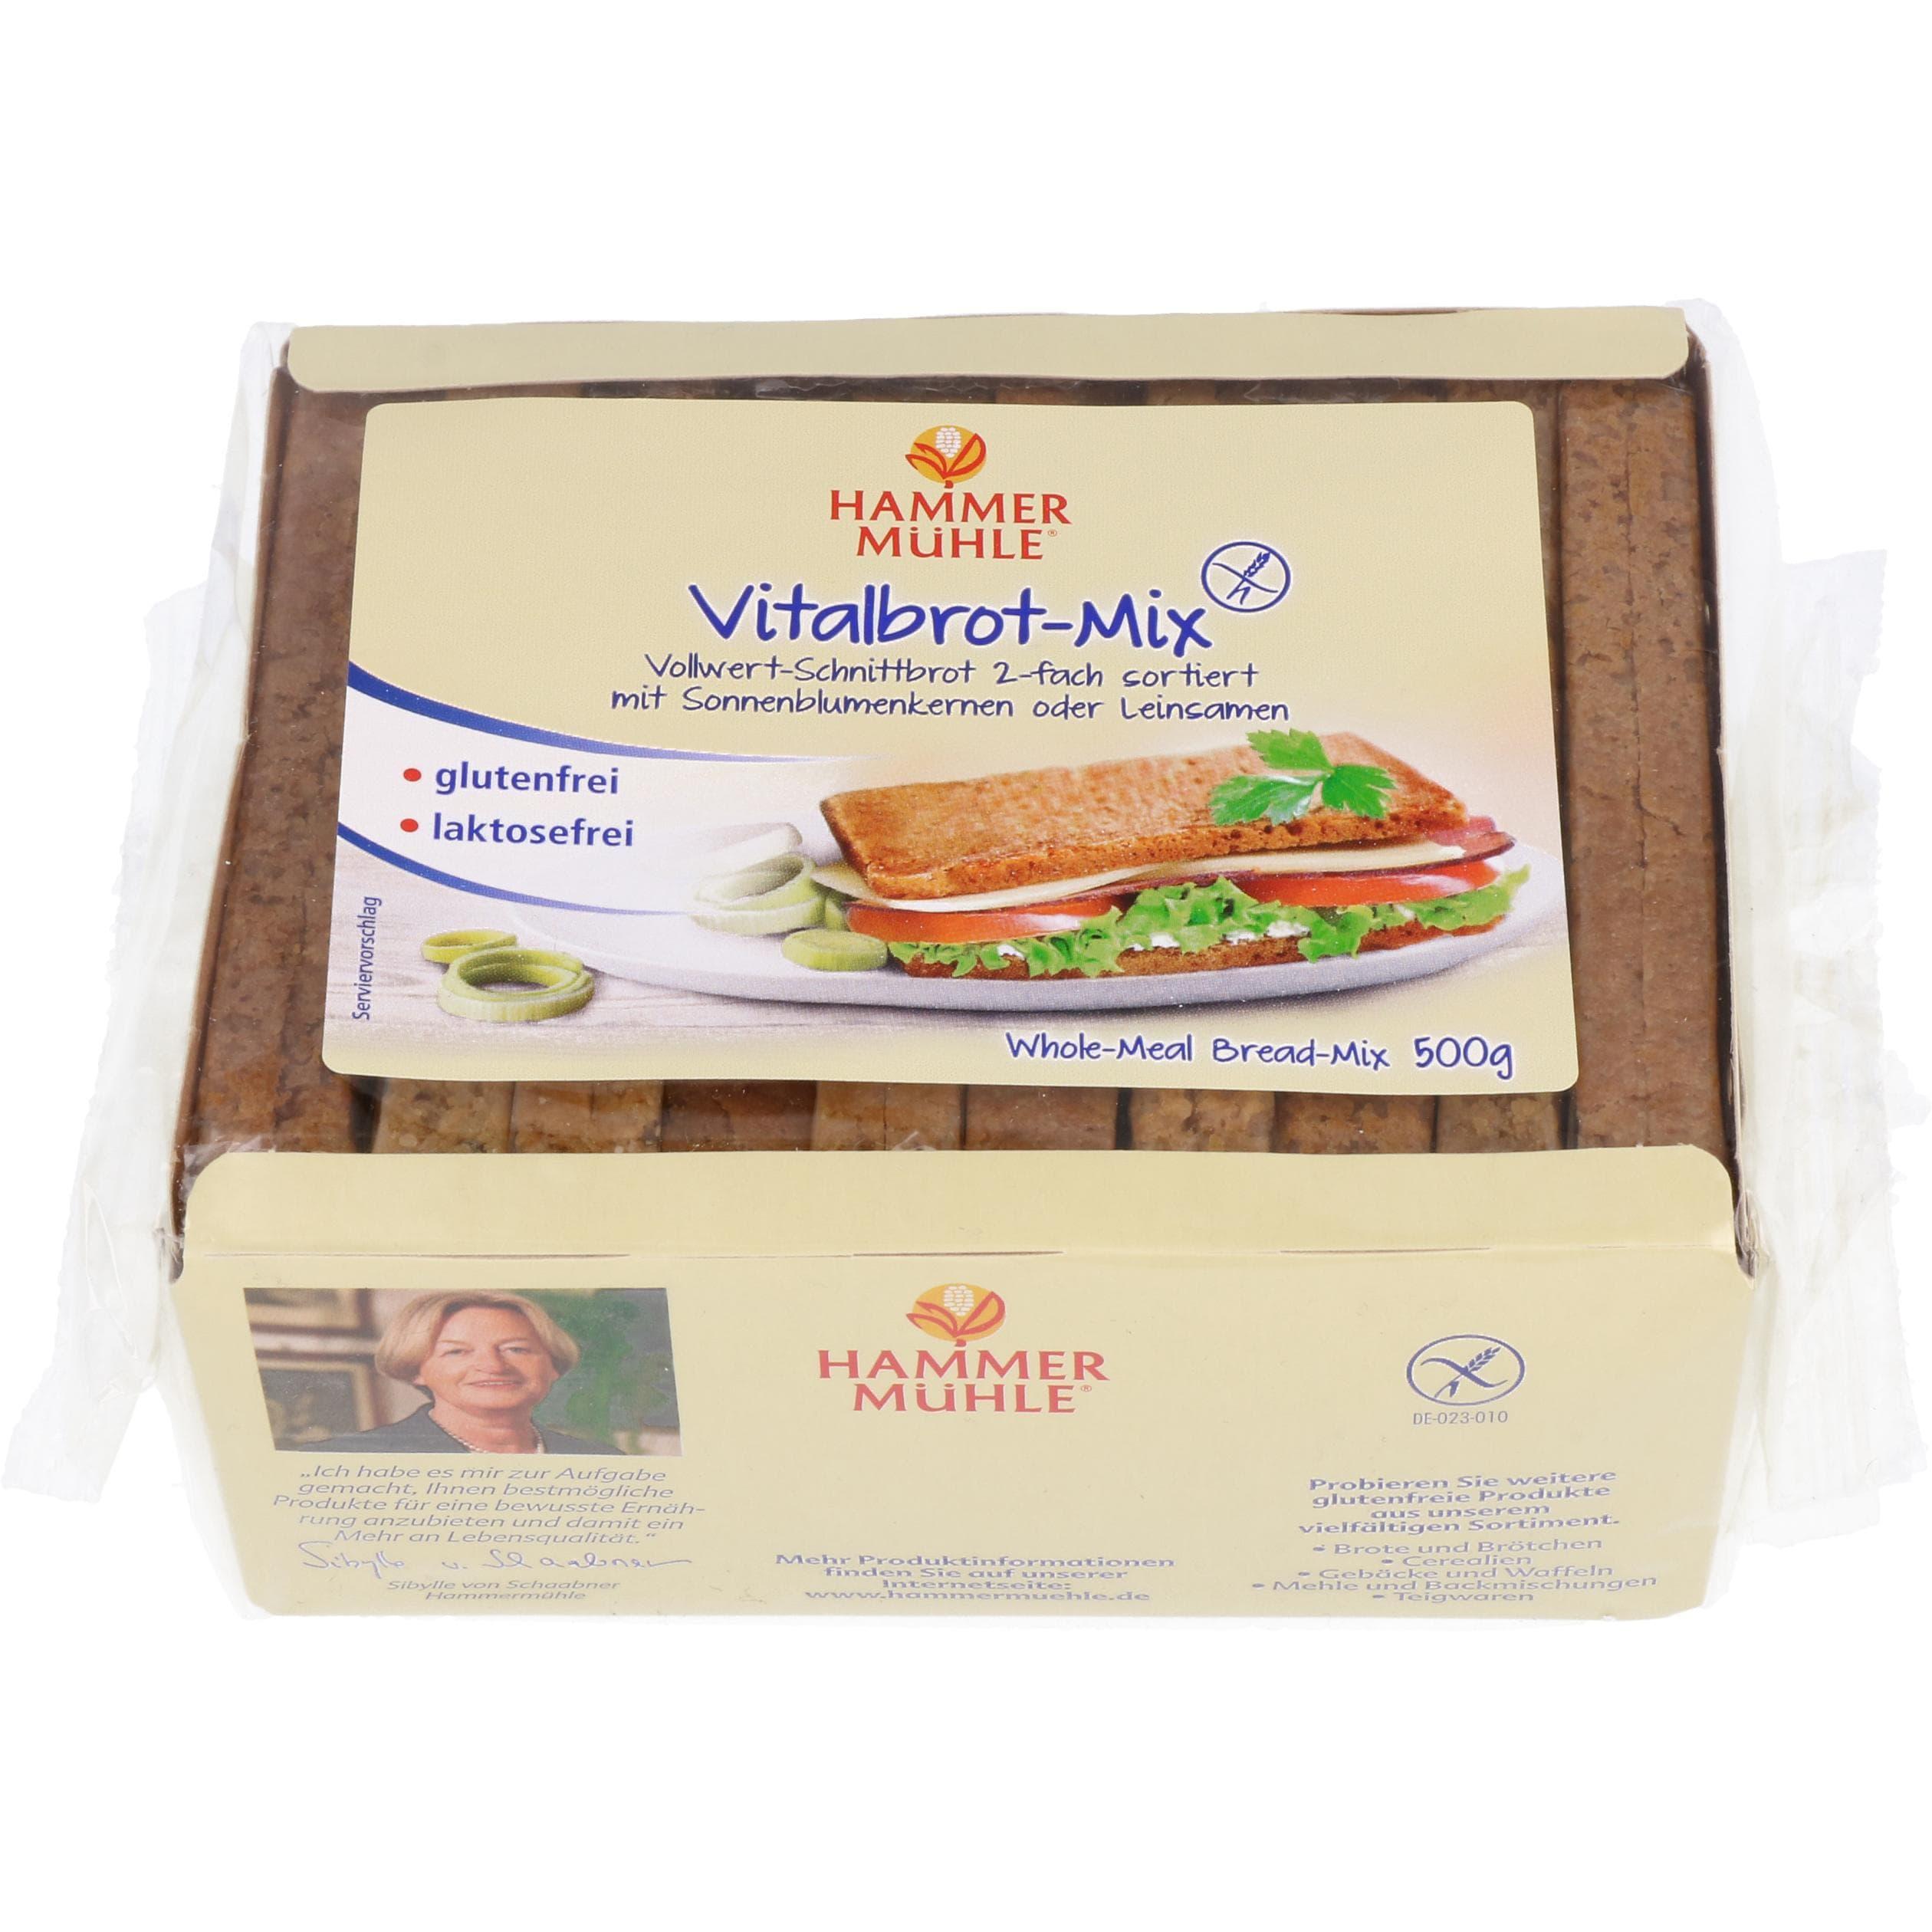 Hammermühle Vitalbrot-Mix 500g